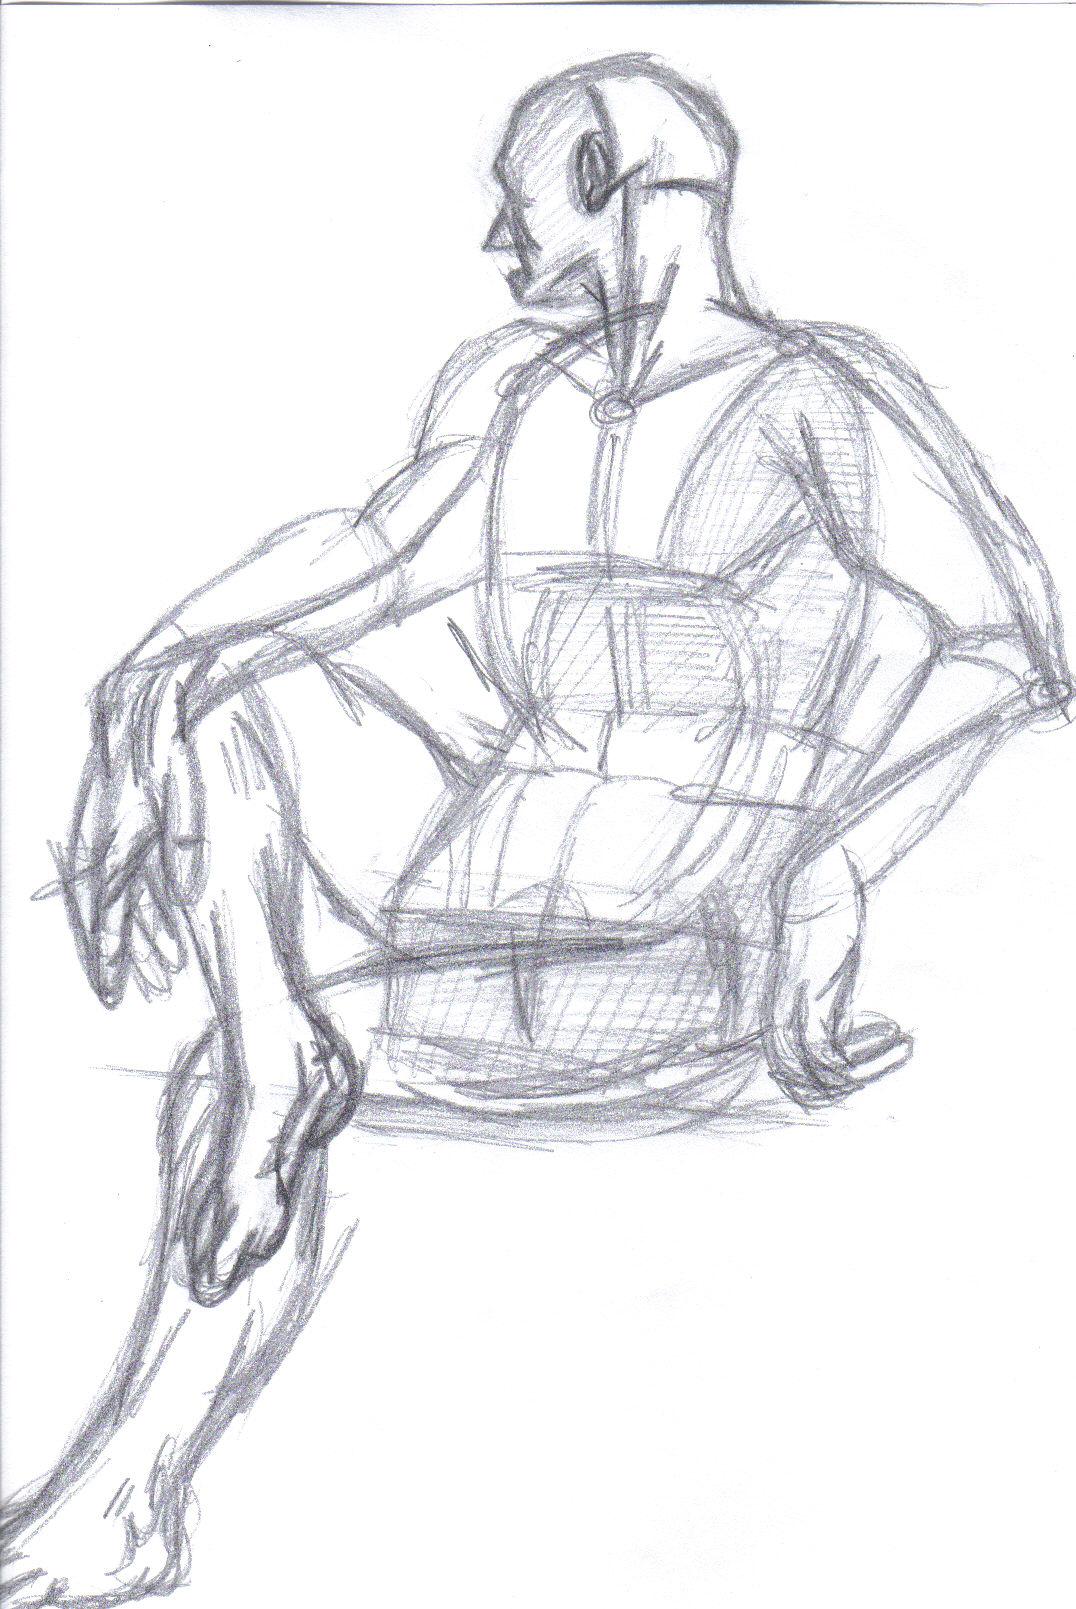 Drawn still life human By Hideous1984 drawing drawing life